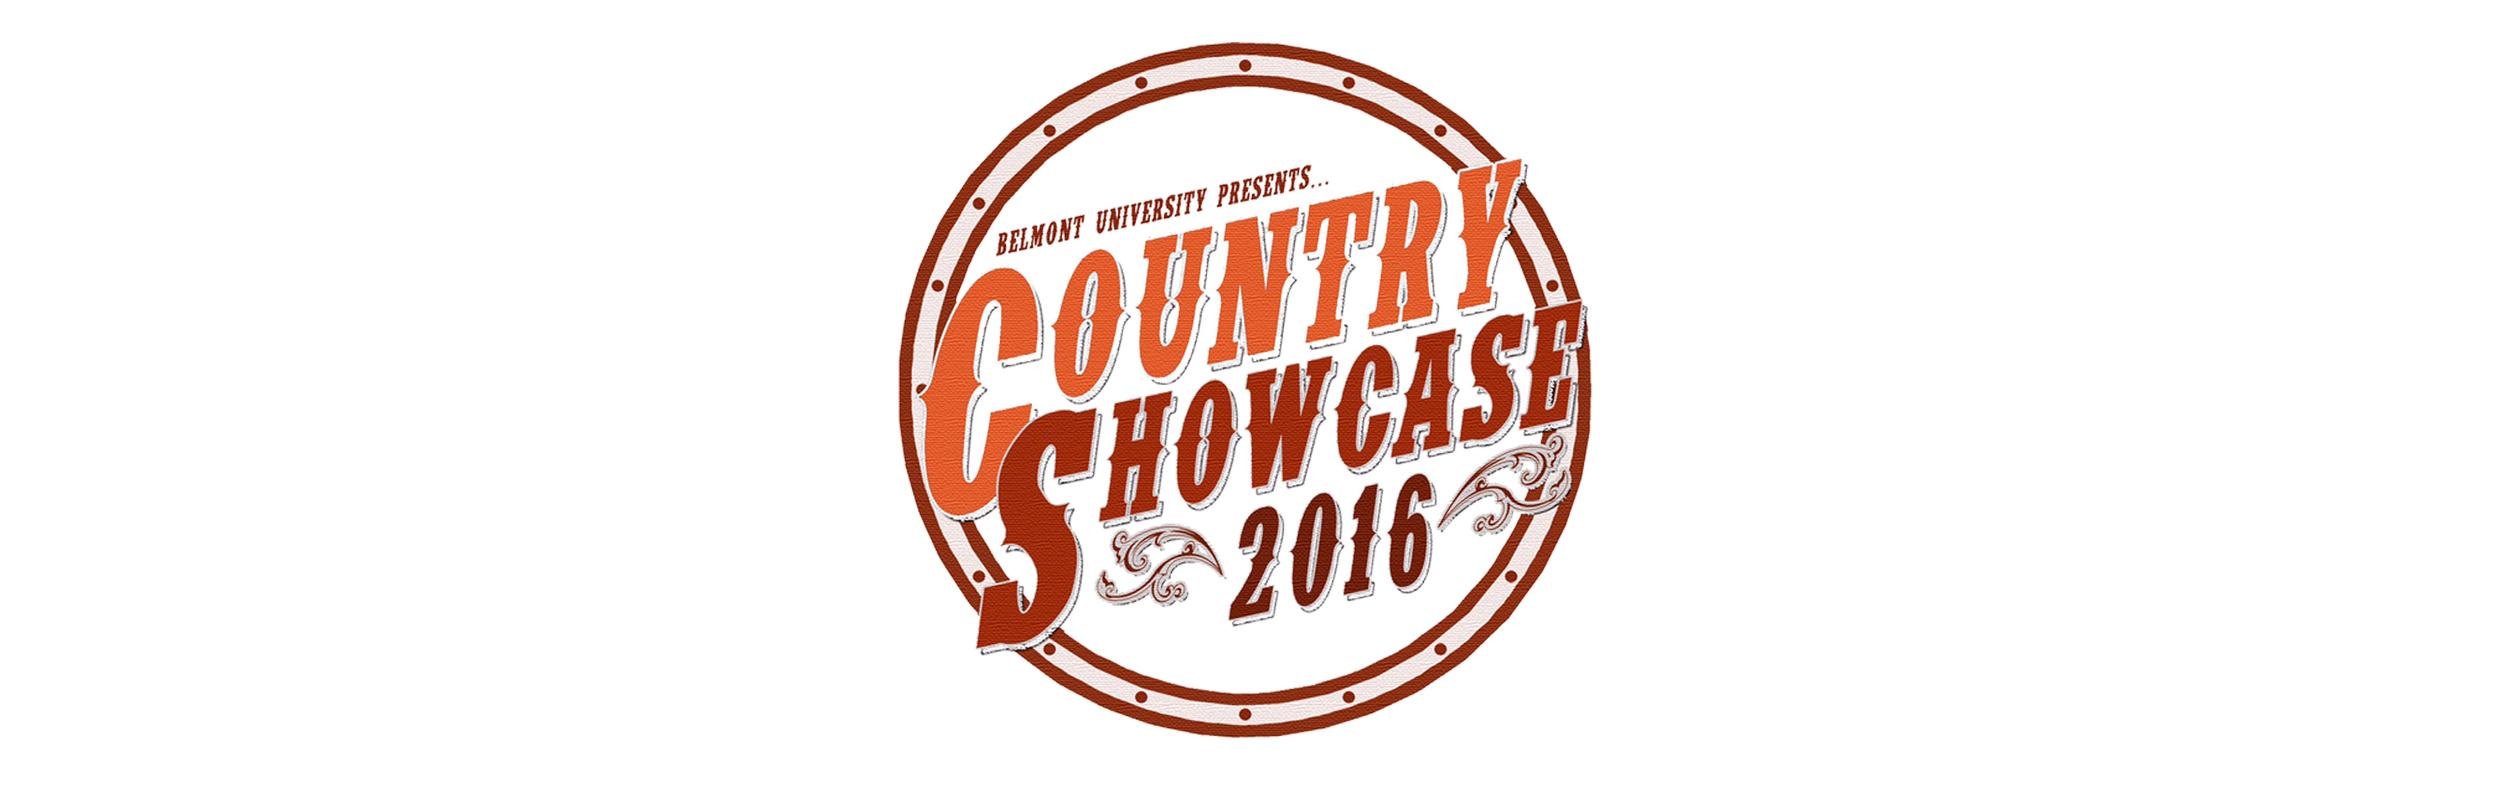 Country 2016 Header Image.jpg